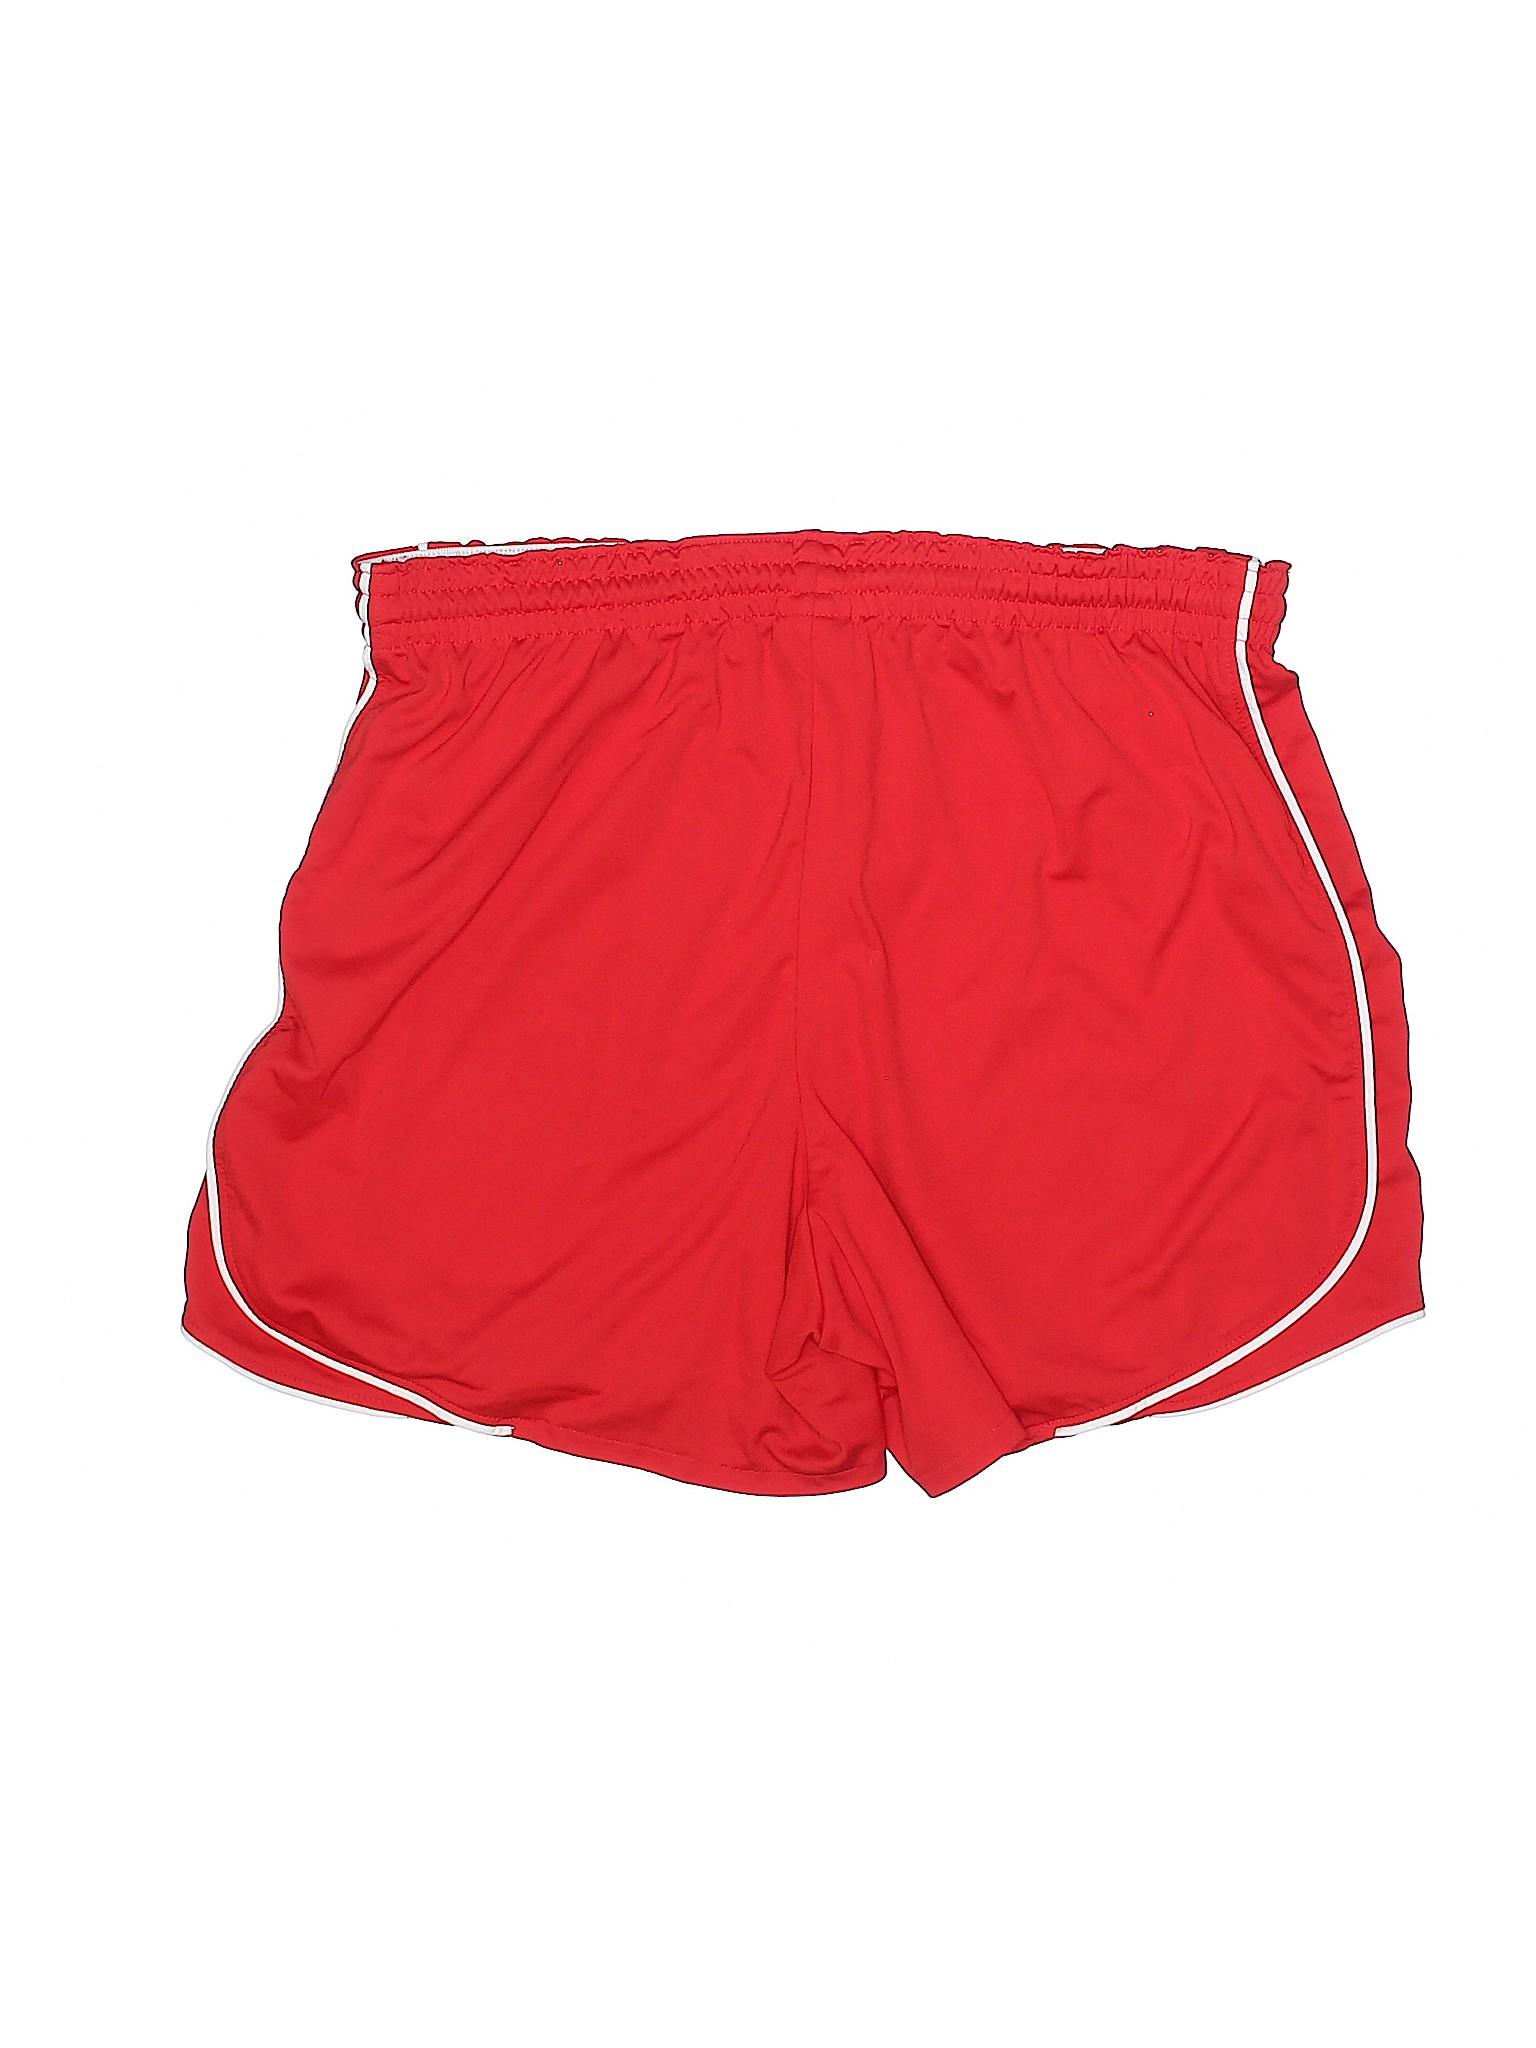 Boutique Shorts Shorts Boutique Athletic Nike Boutique Athletic Shorts Nike Athletic Nike Boutique Boutique Shorts Athletic Nike AwpdAx